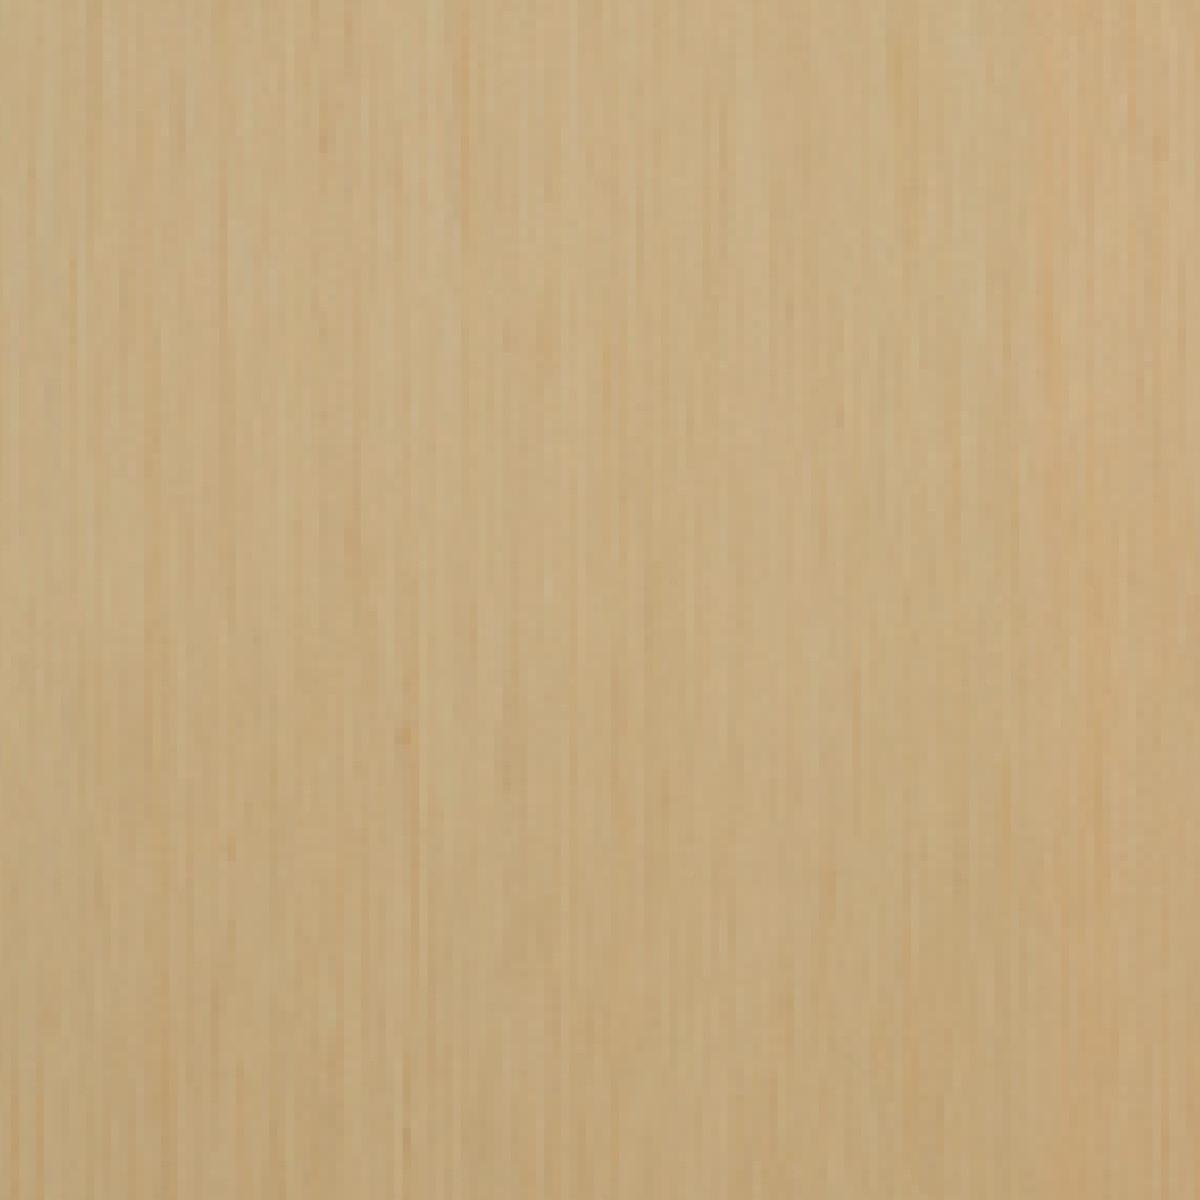 01 Maple